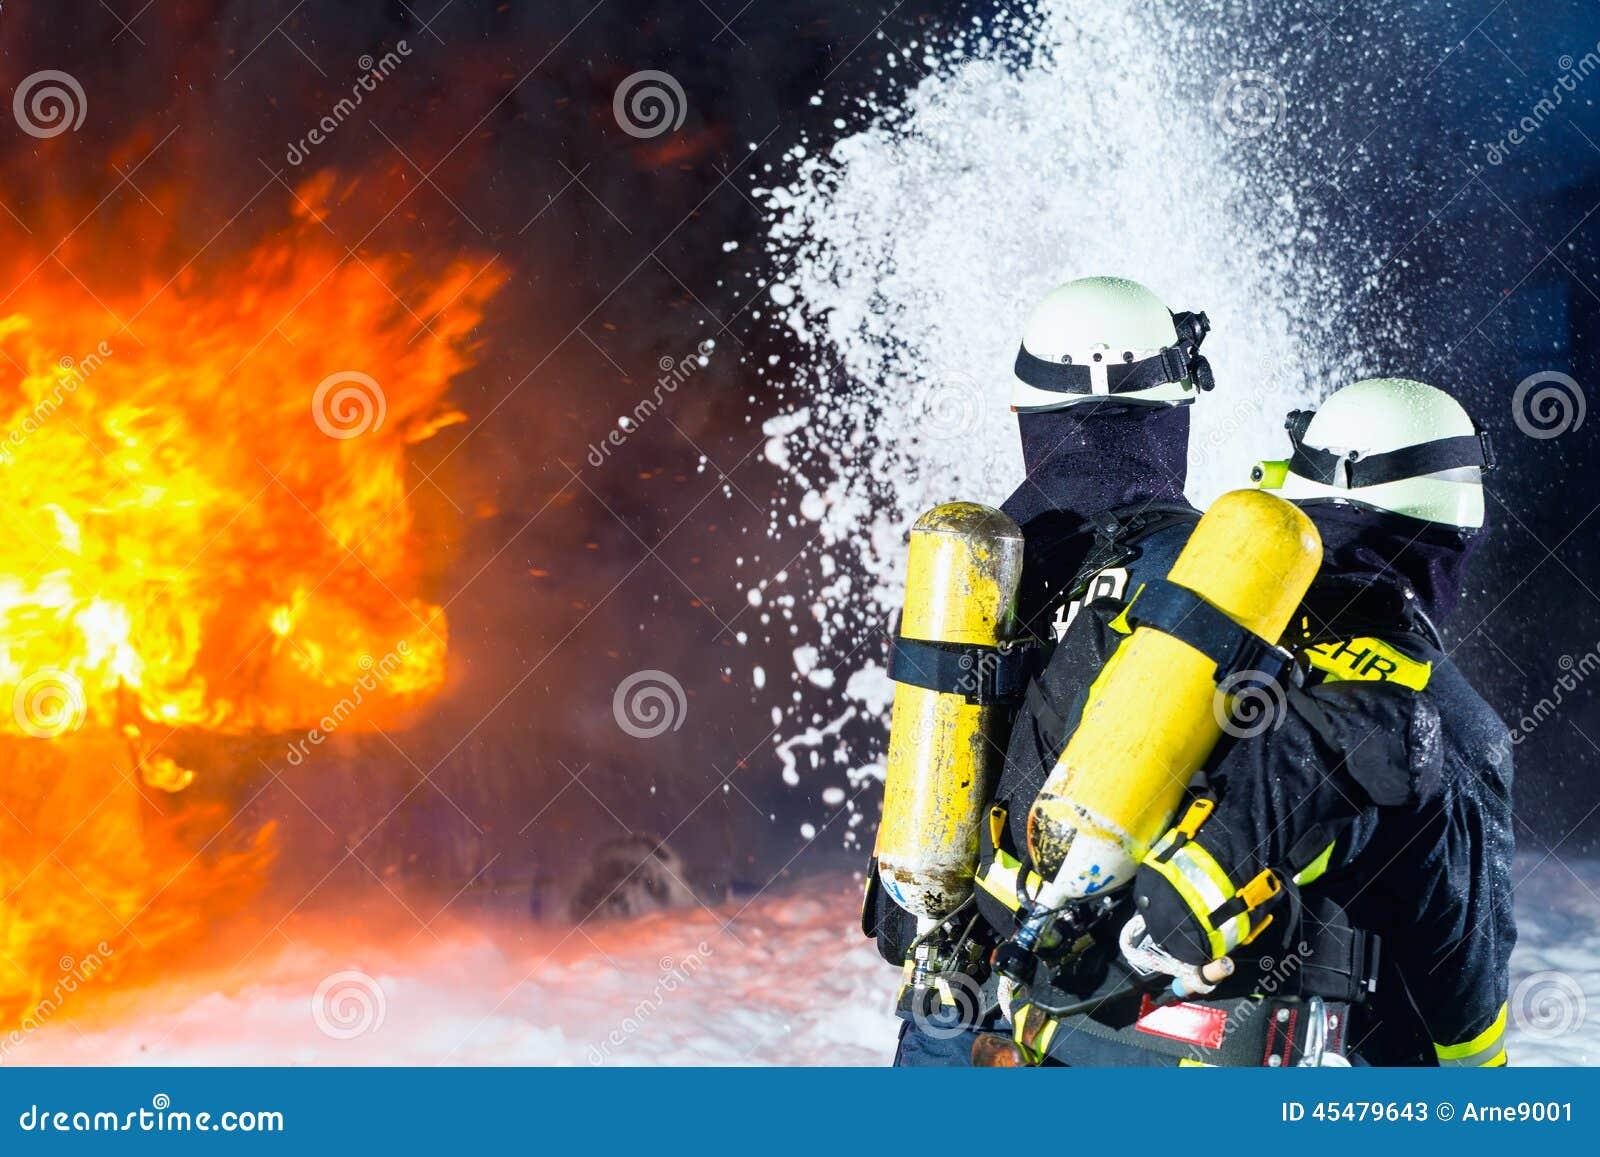 Firefighter - Firemen extinguishing a large blaze